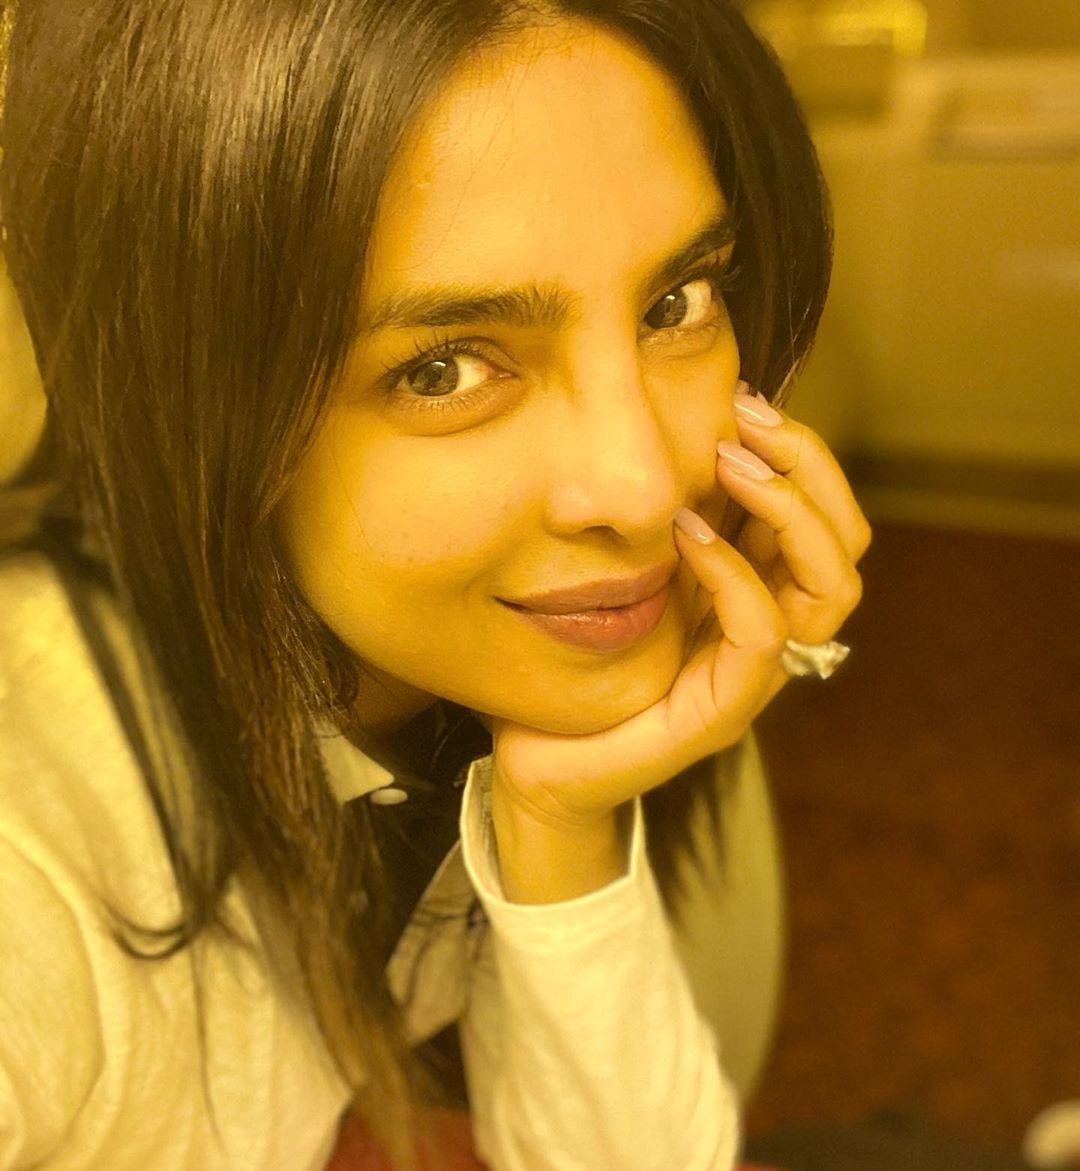 Priyanka Chopra 4 HD images